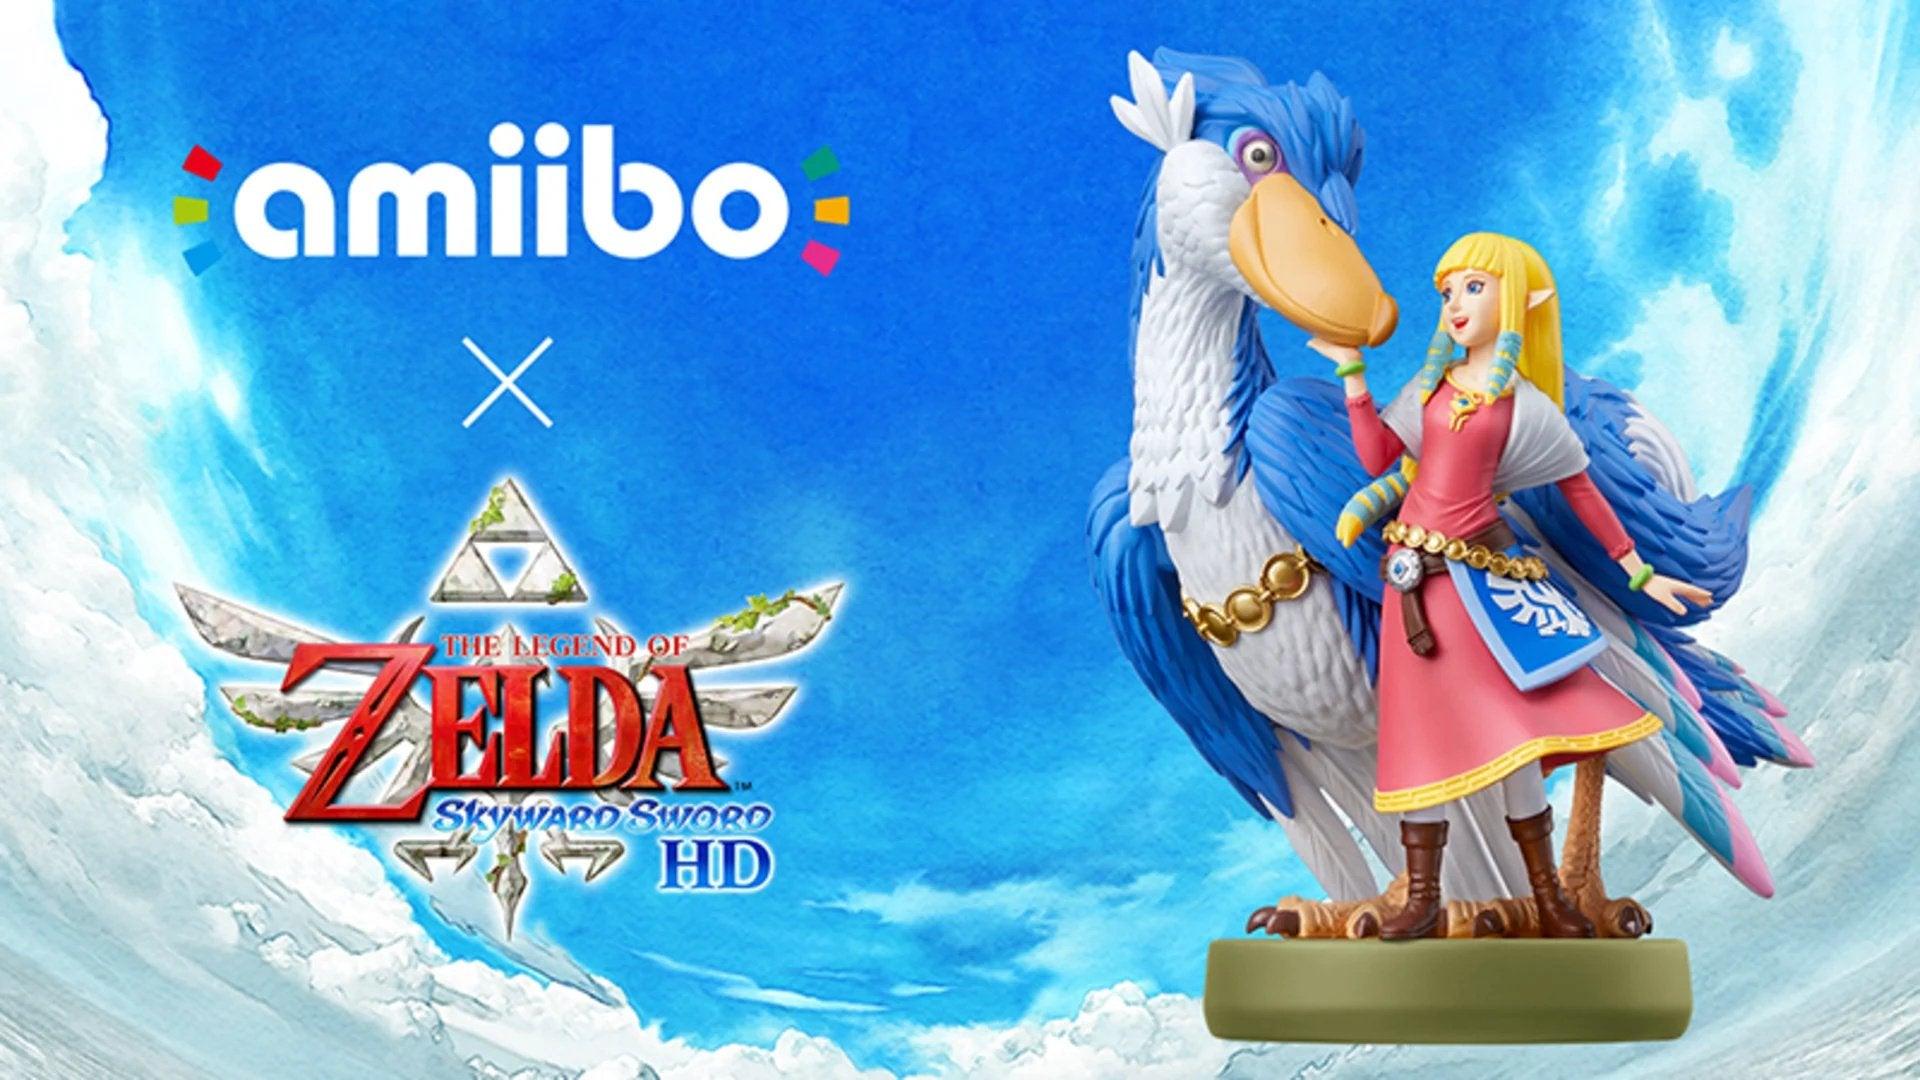 Image for Make no mistake, Nintendo's Zelda: Skyward Sword amiibo unlock is a dirty play